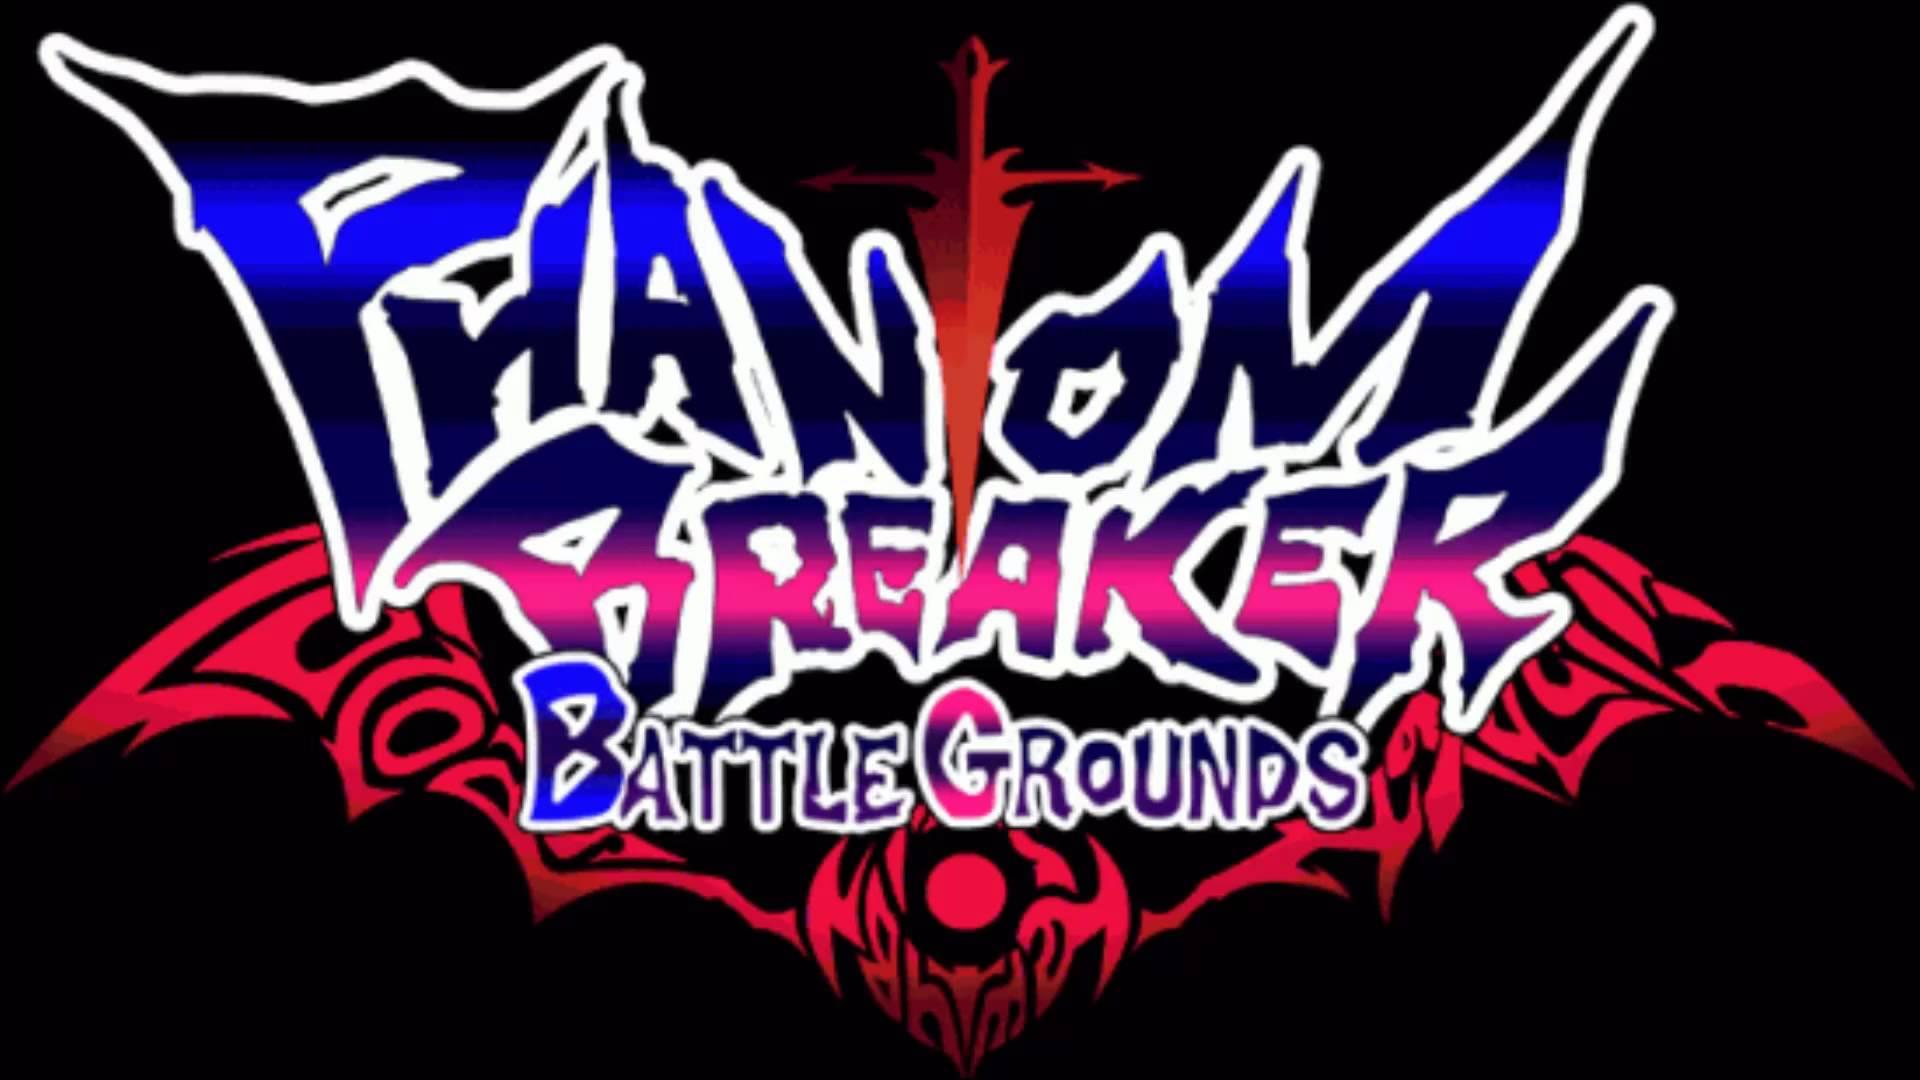 Phantom Breaker: Battle Grounds Backgrounds on Wallpapers Vista